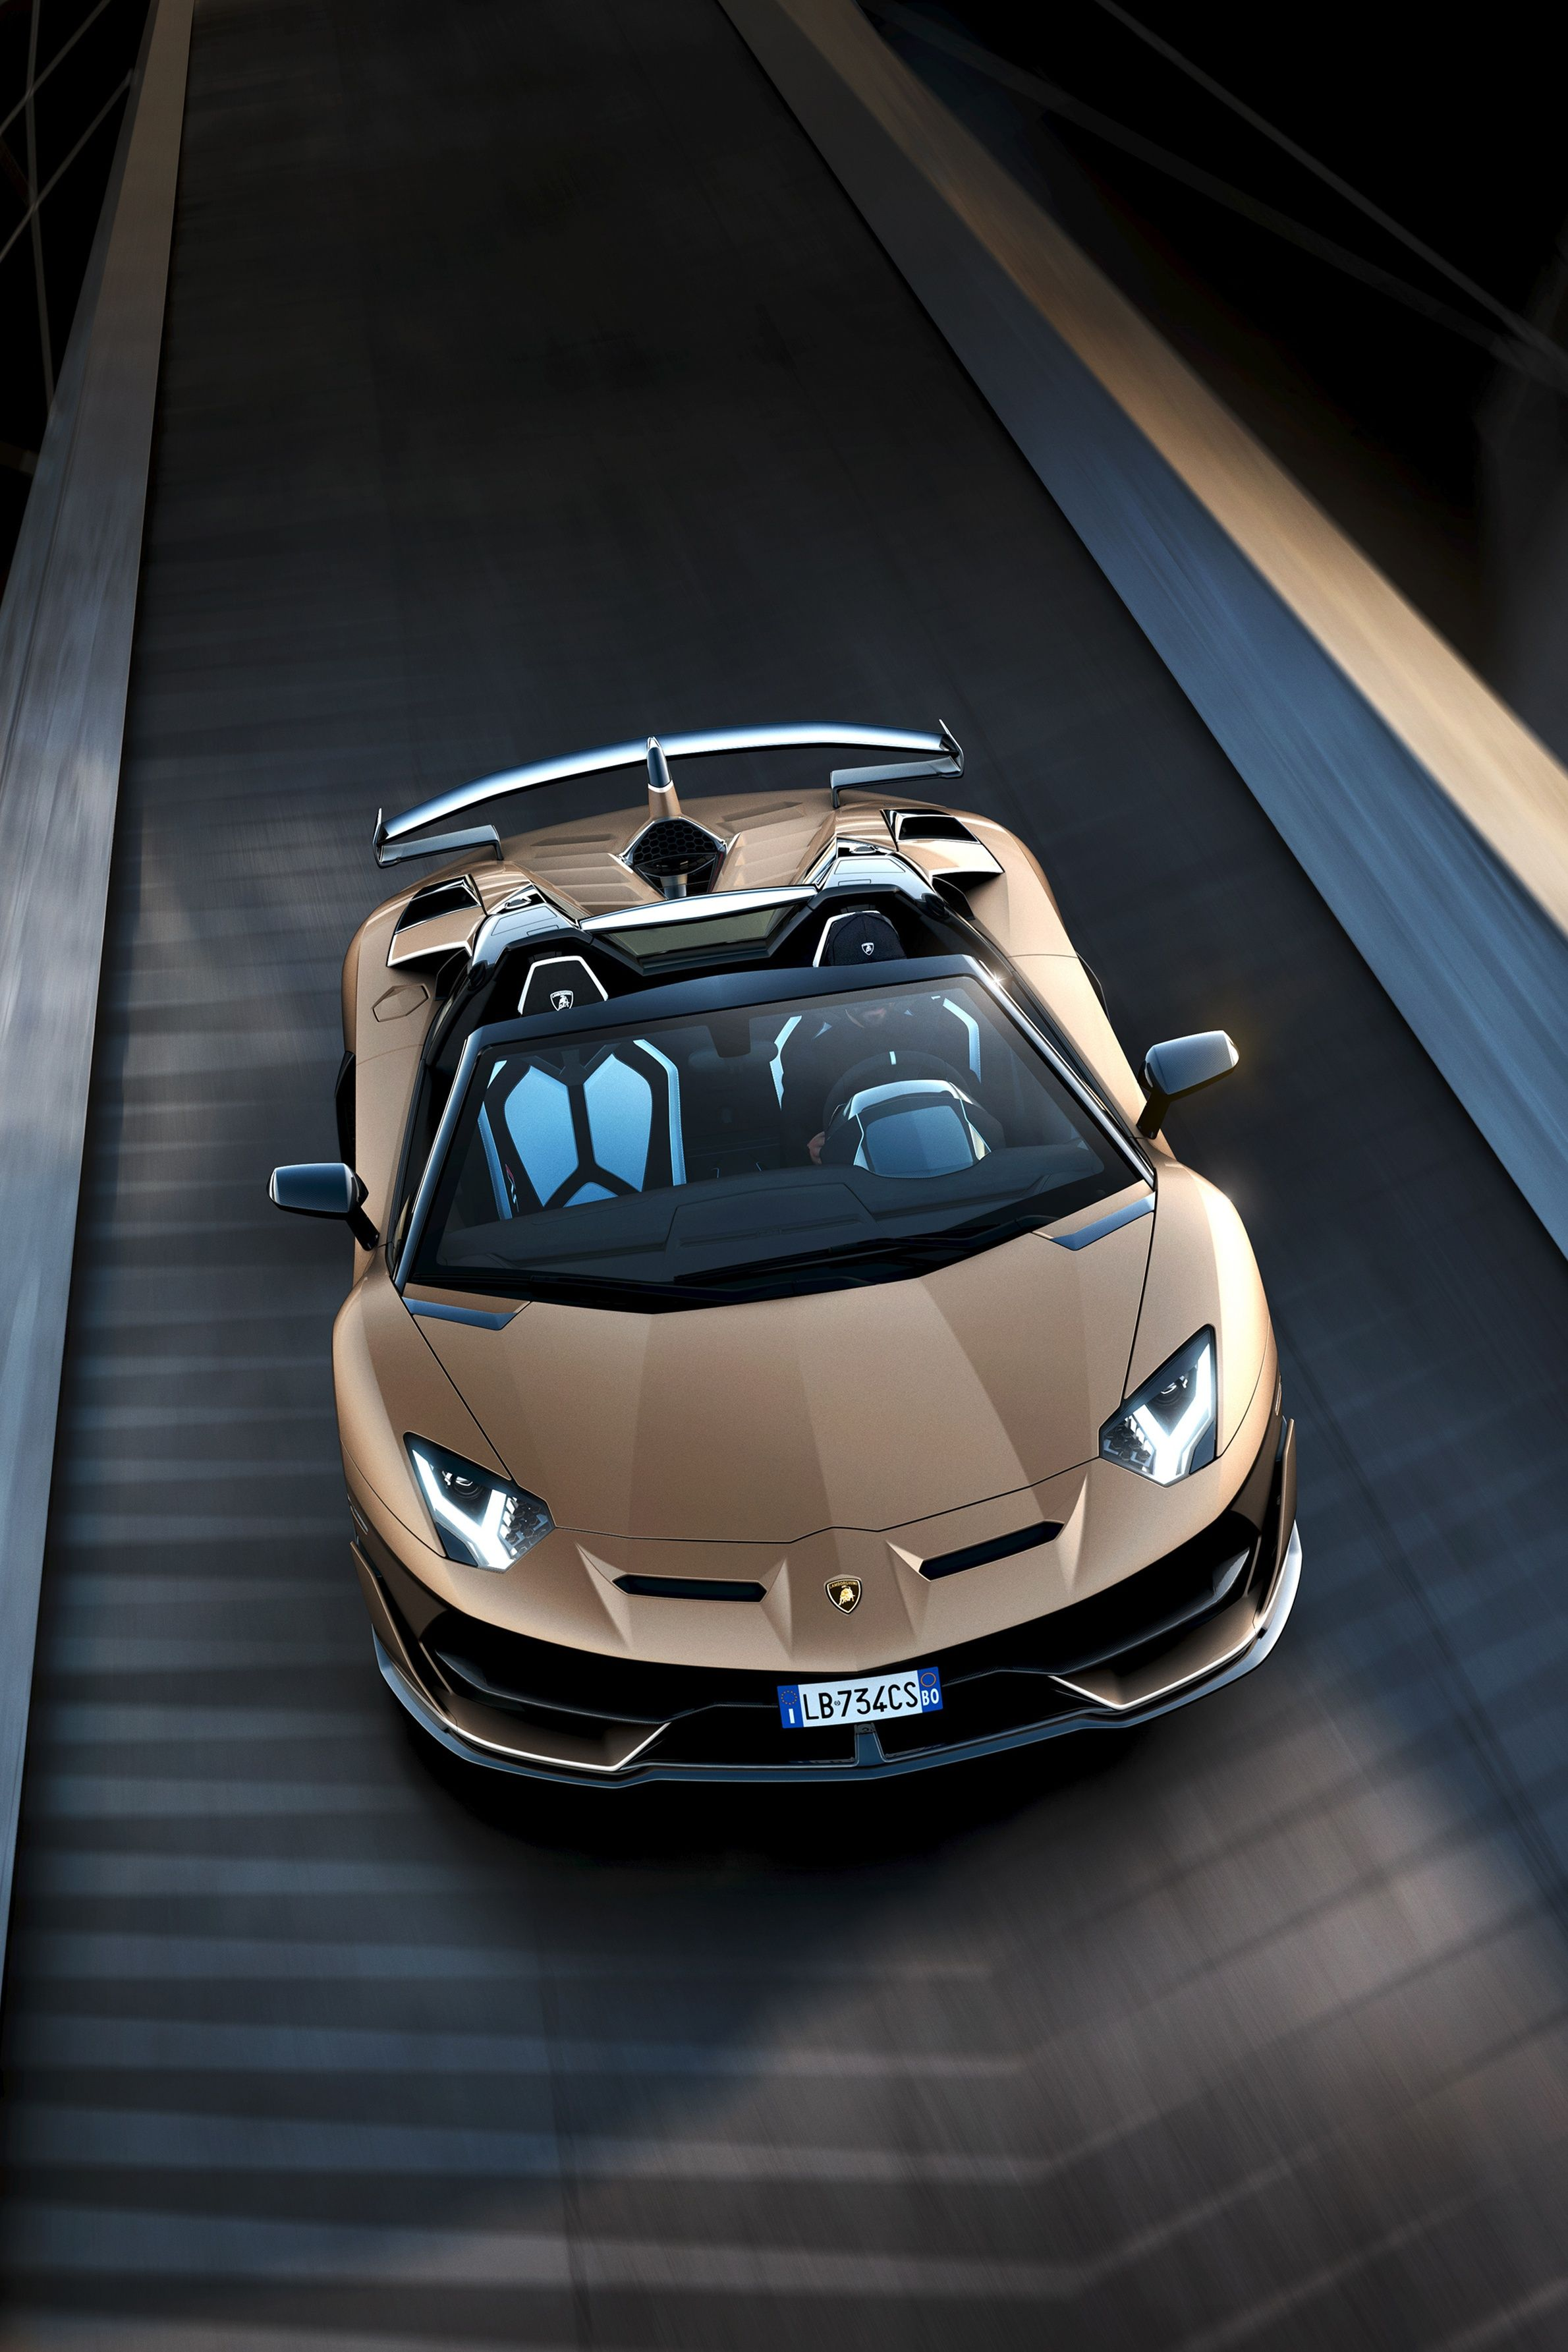 2019 Lamborghini Aventador Svj Roadster The Man Moving Fw